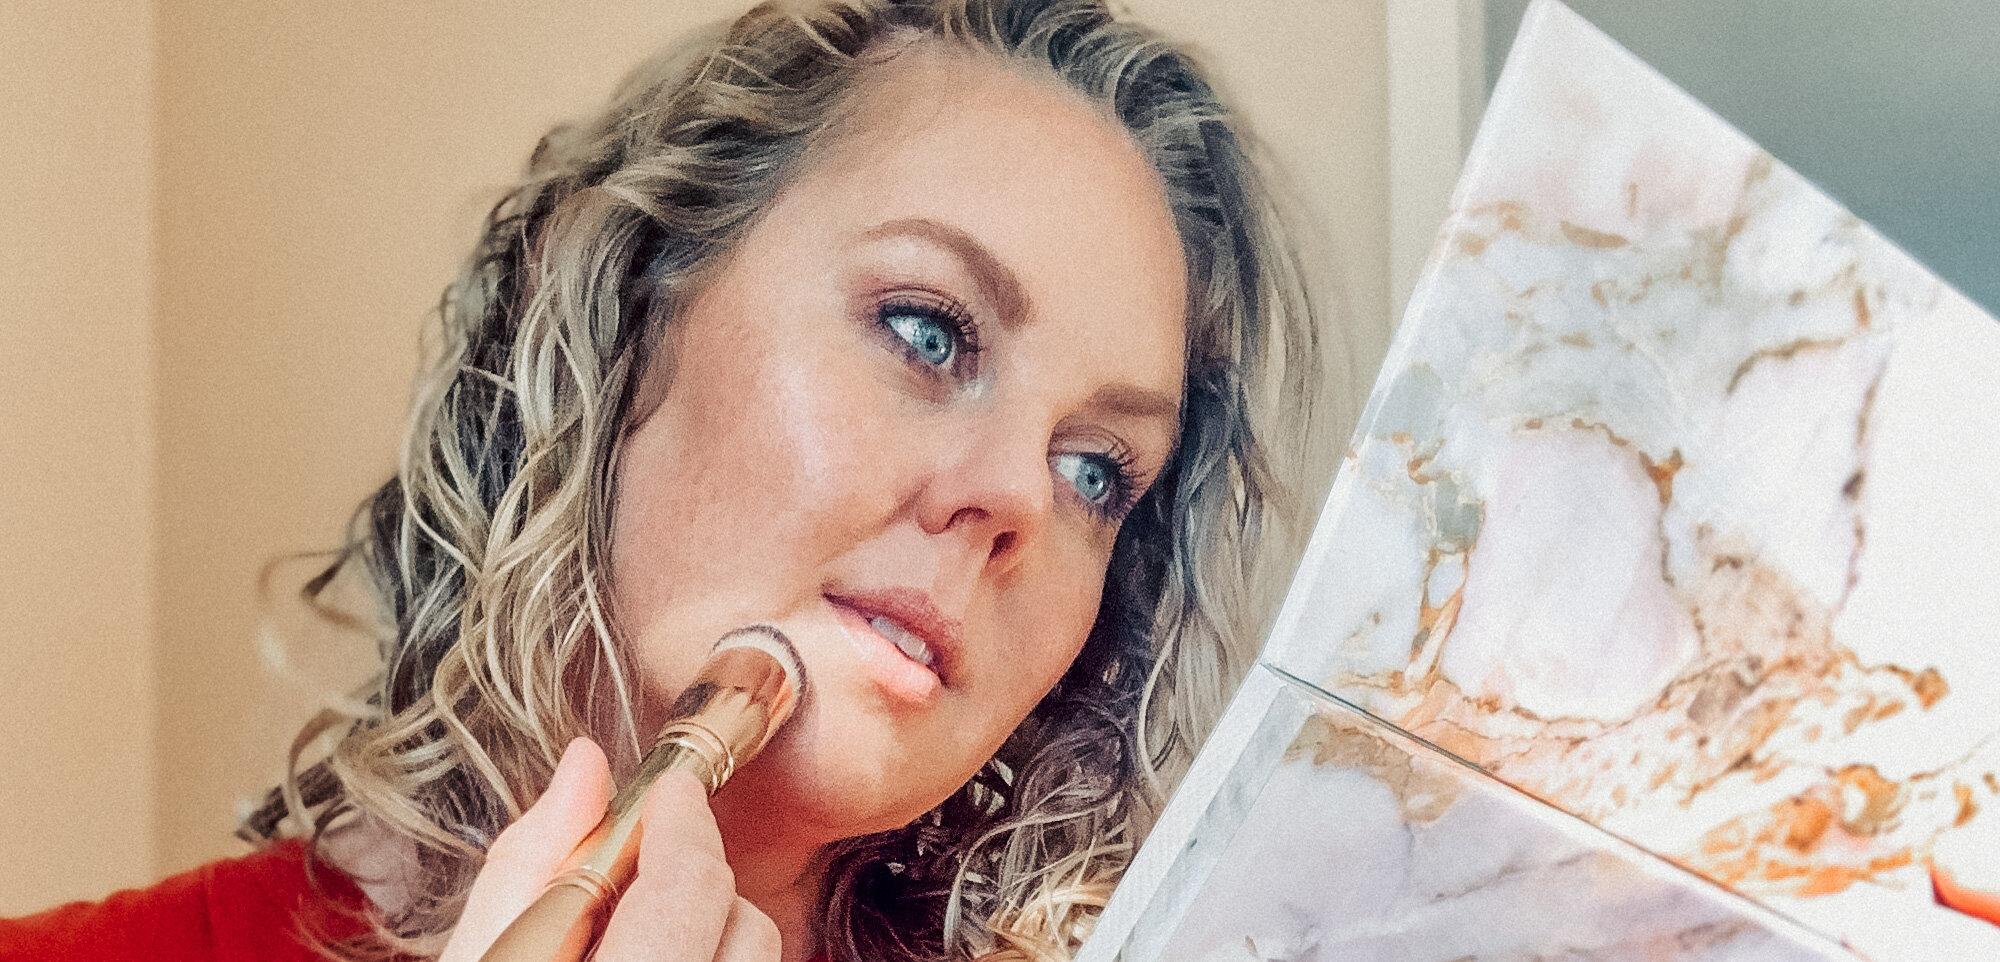 Free Online Makeup Consultation